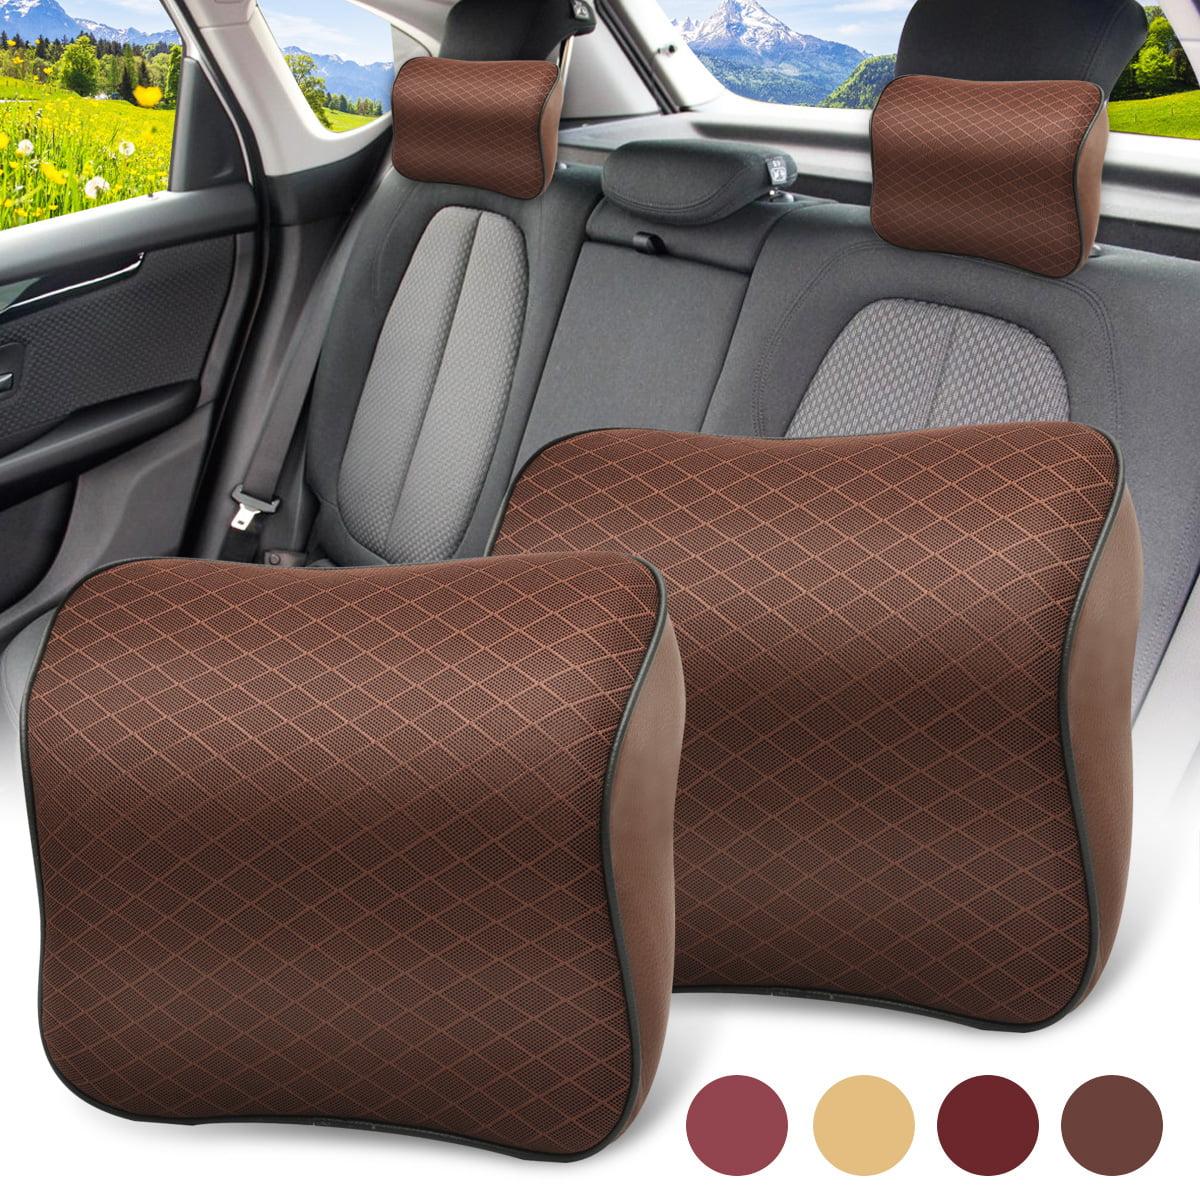 Neck Cushion Car Seat Headrest Pillow Breathable Mesh PU Leather Pad Memory Foam (Color: Beige, neckguard cushion Wine red, Coffee, Purple)